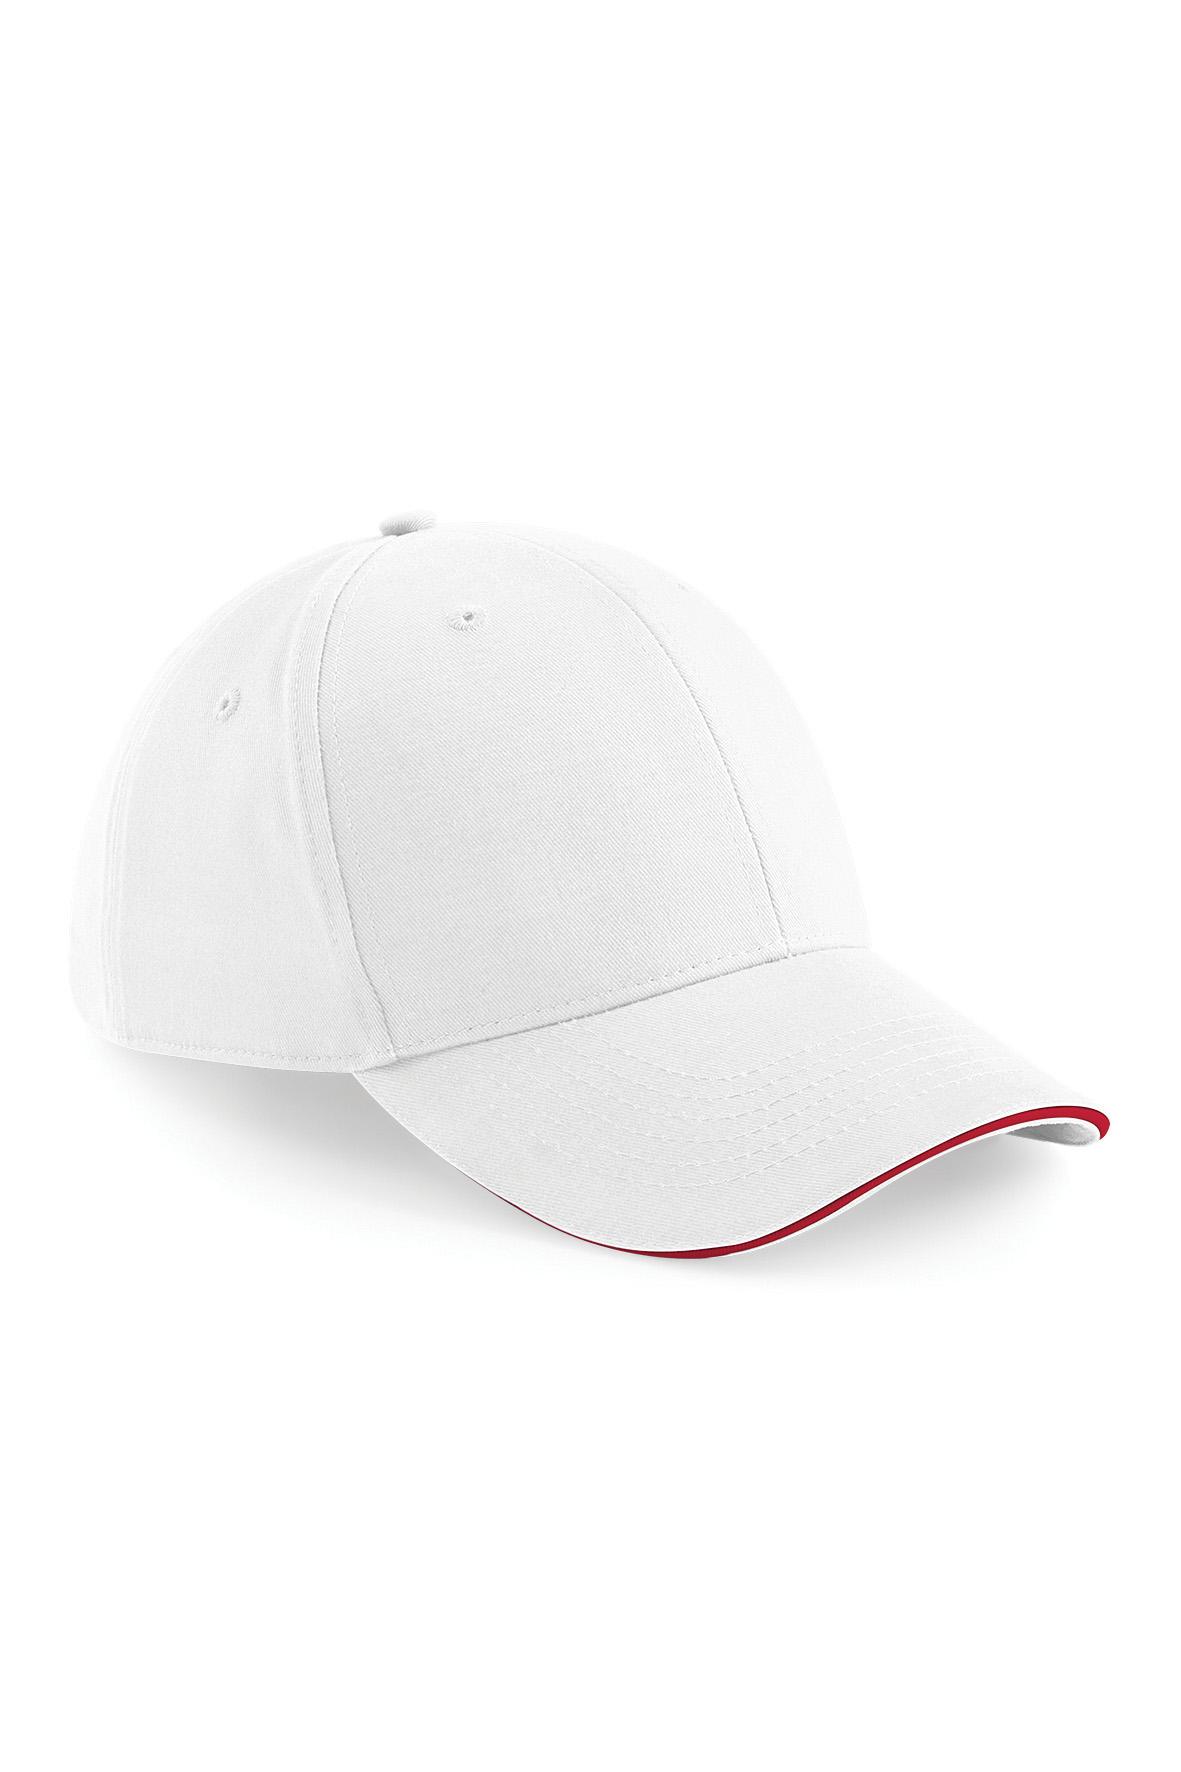 Athleisure Lippis Valkoinen - Classic Red